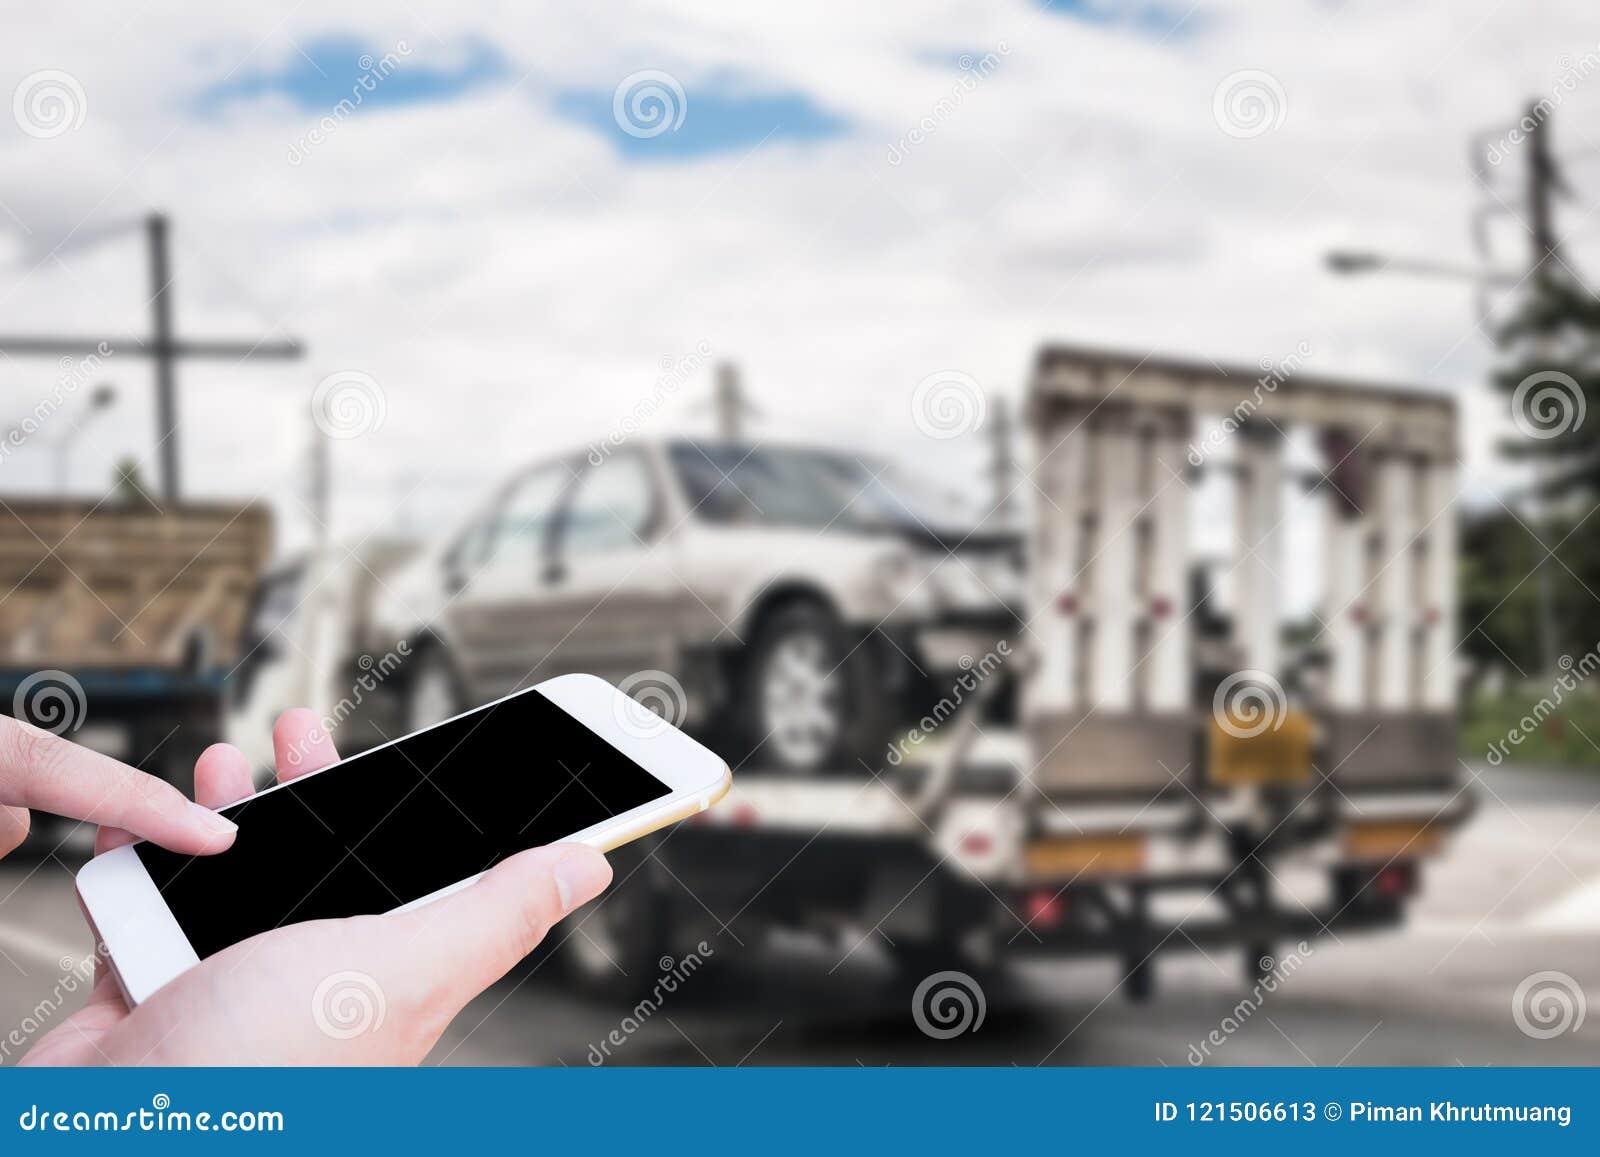 Emergency Roadside Service >> Hand Using Mobile Smartphone For Emergency Roadside Service